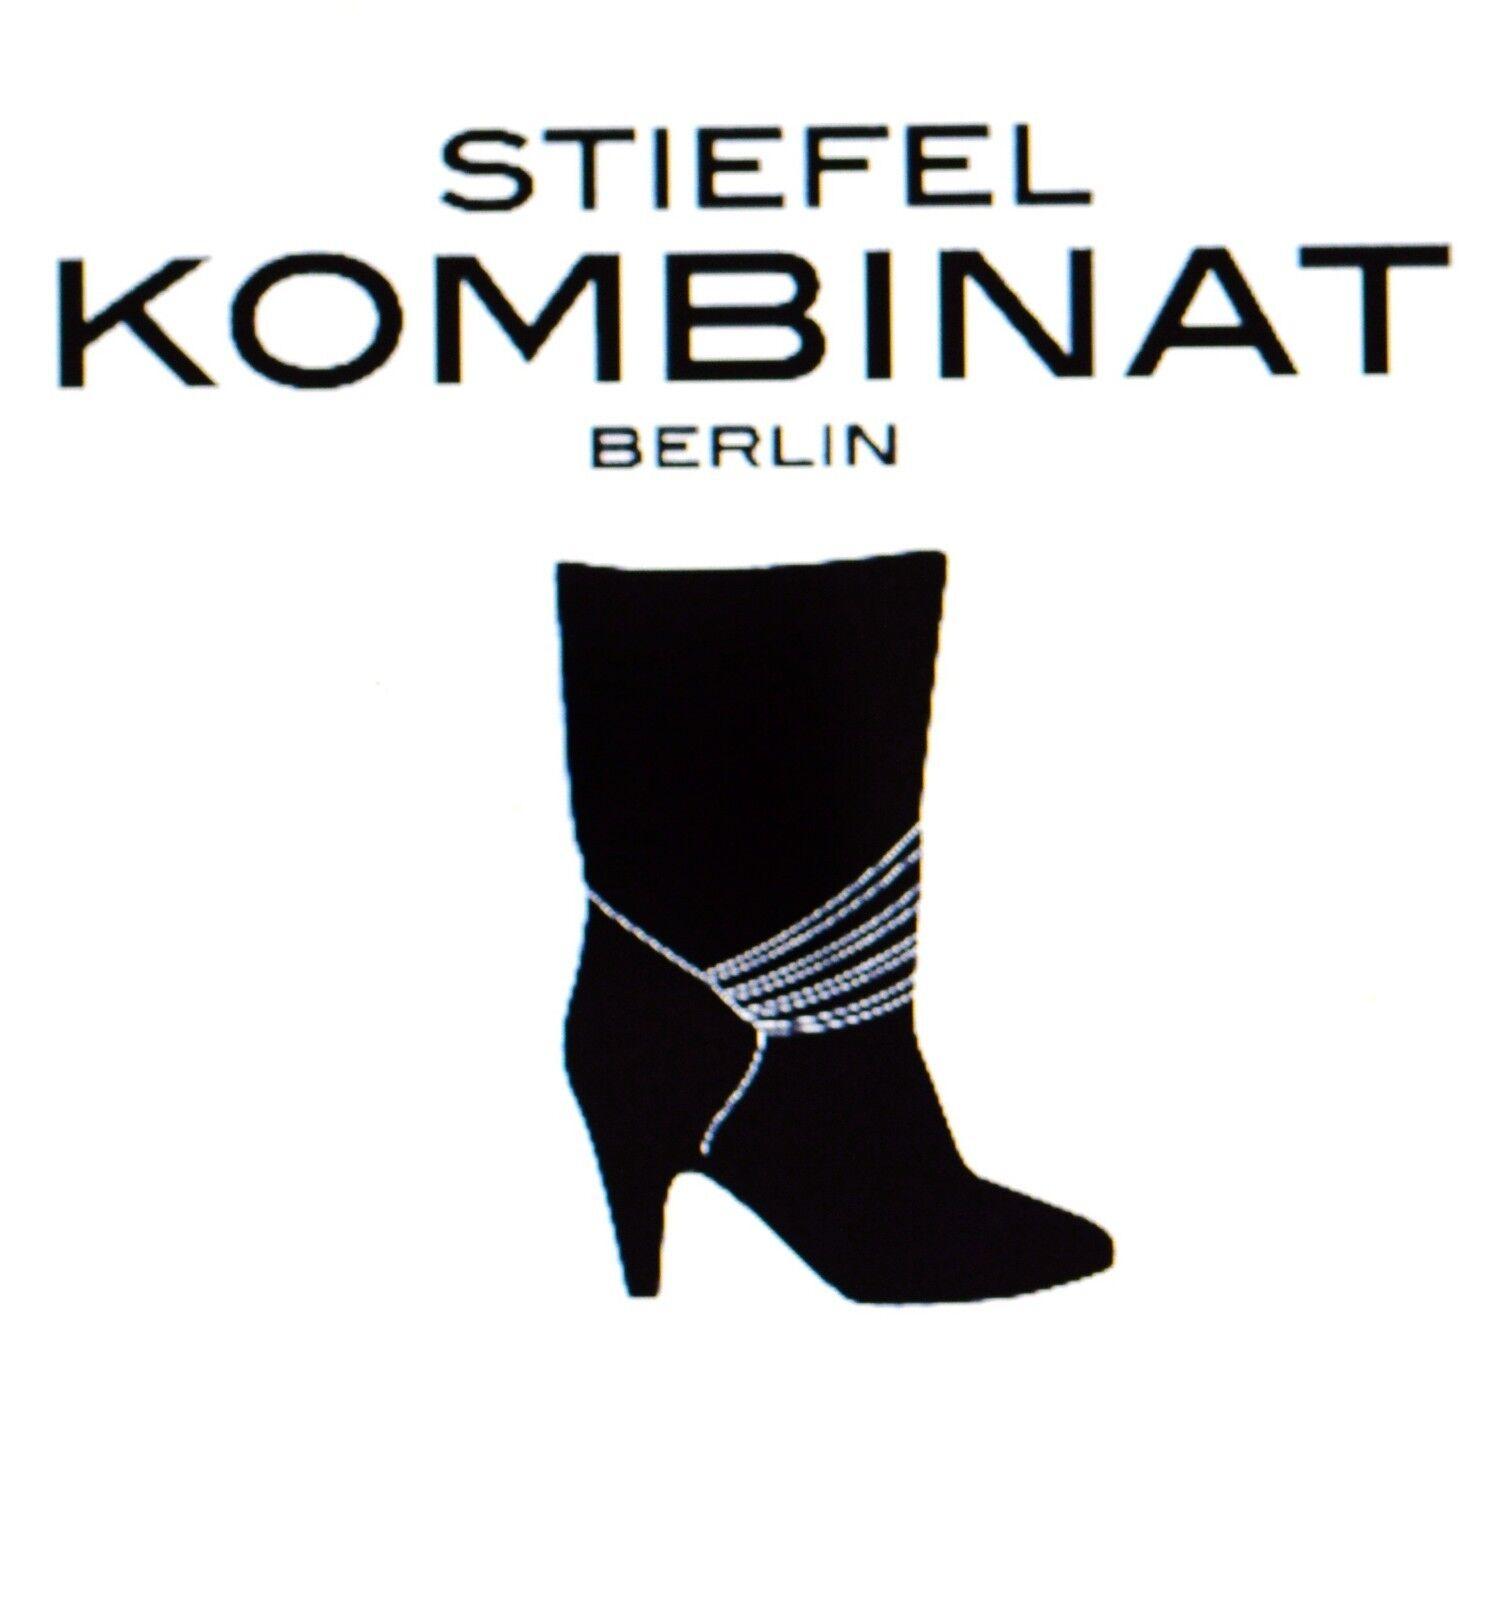 Damen Keil Stiefel wedges Stiefel 70er TRUE VINTAGE 80s Winterstiefel wedges Stiefel cales talon 8e2f75